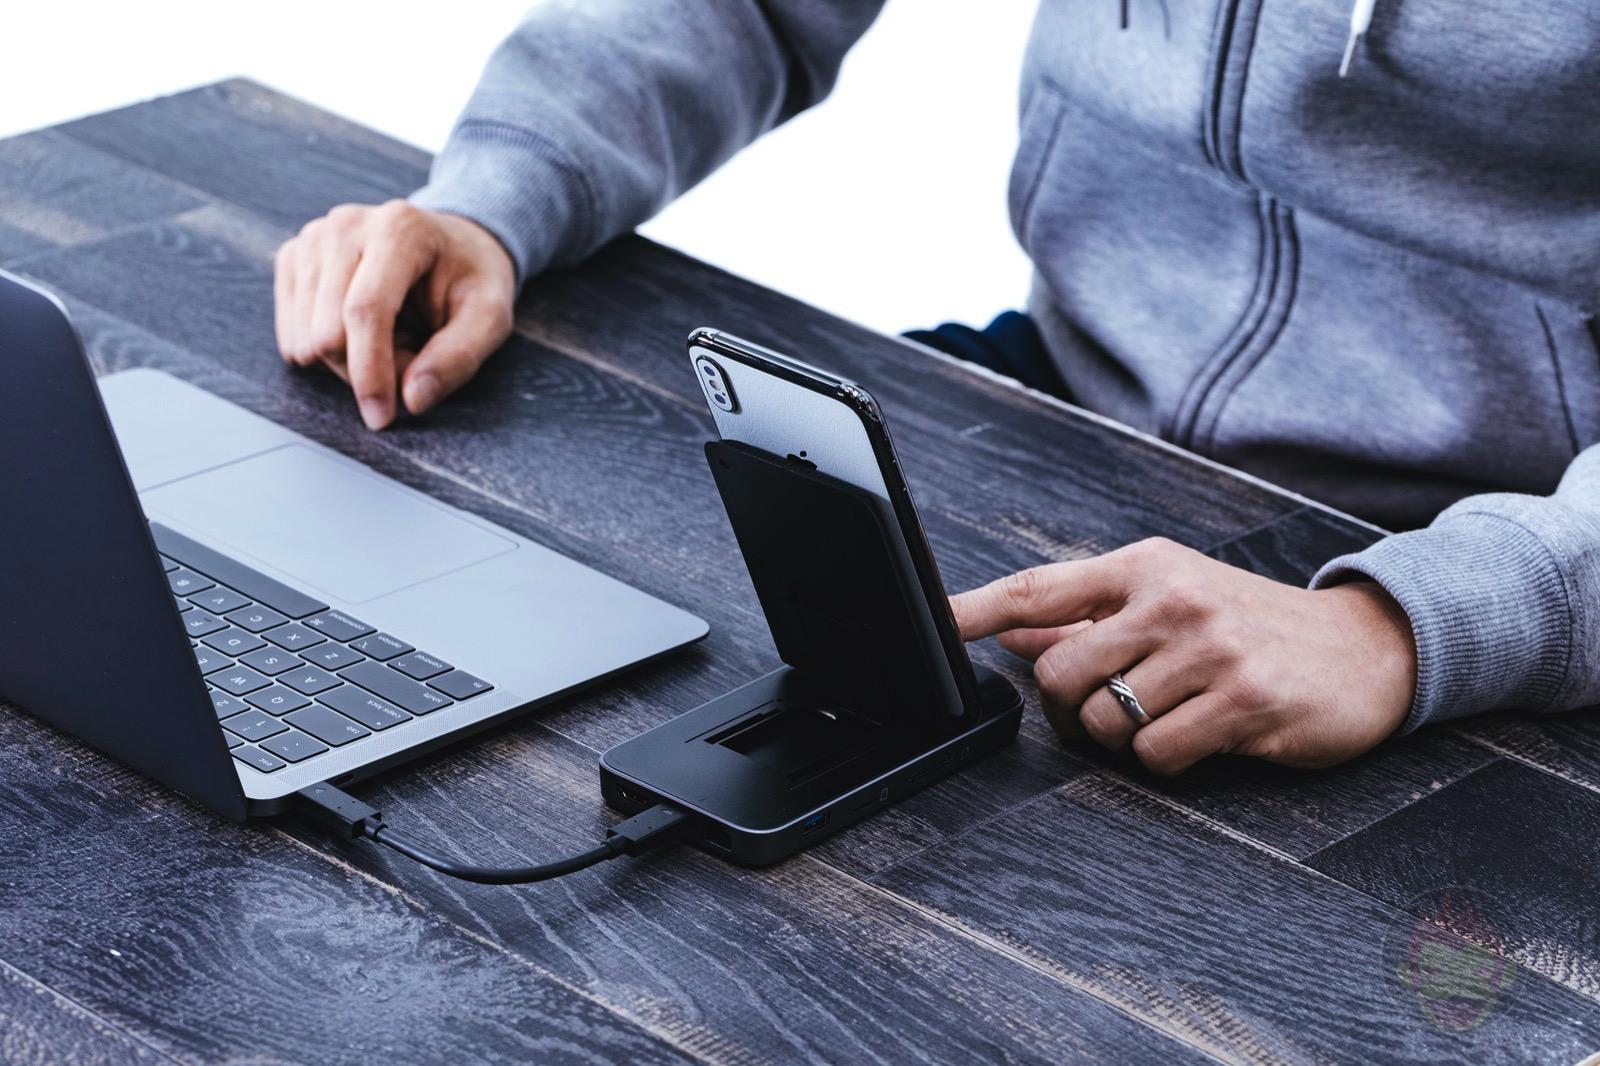 HyperDrive-Wireless-Charger-USBC-Hub-Review-05.jpg